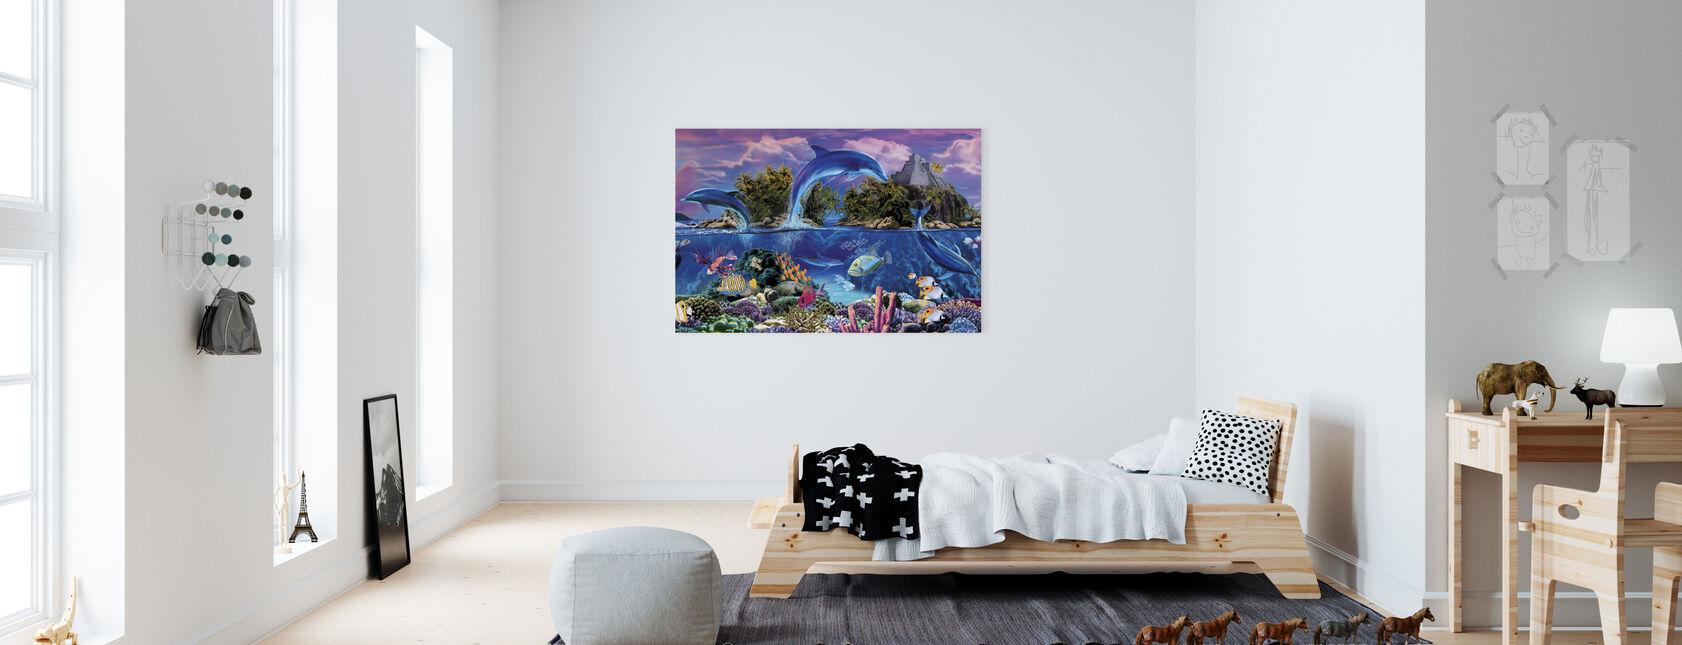 Meren Panorama - Canvastaulu - Lastenhuone